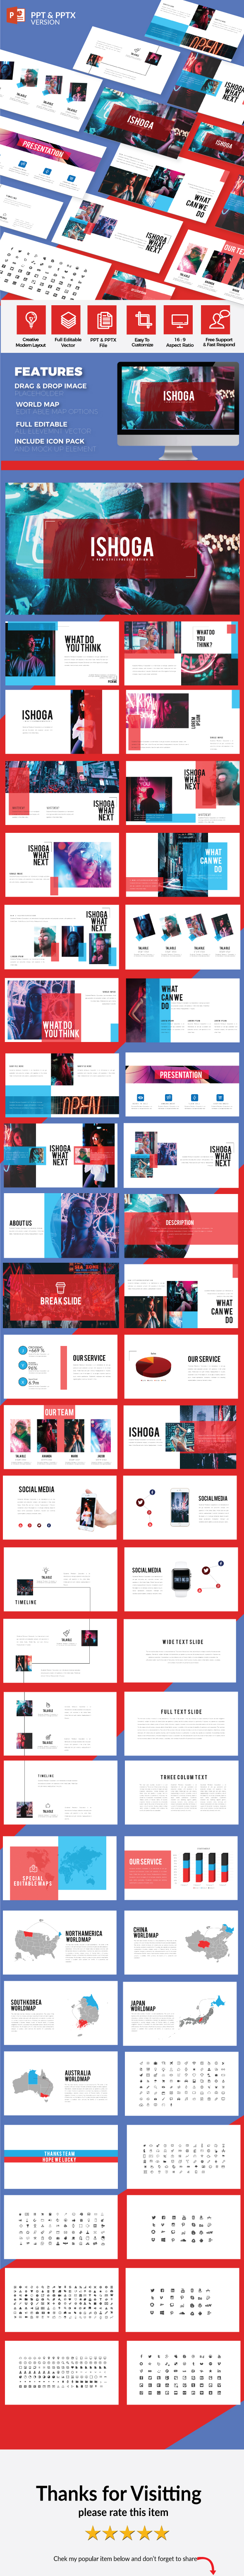 Ishoga - Multipurpose Presentation Template - PowerPoint Templates Presentation Templates